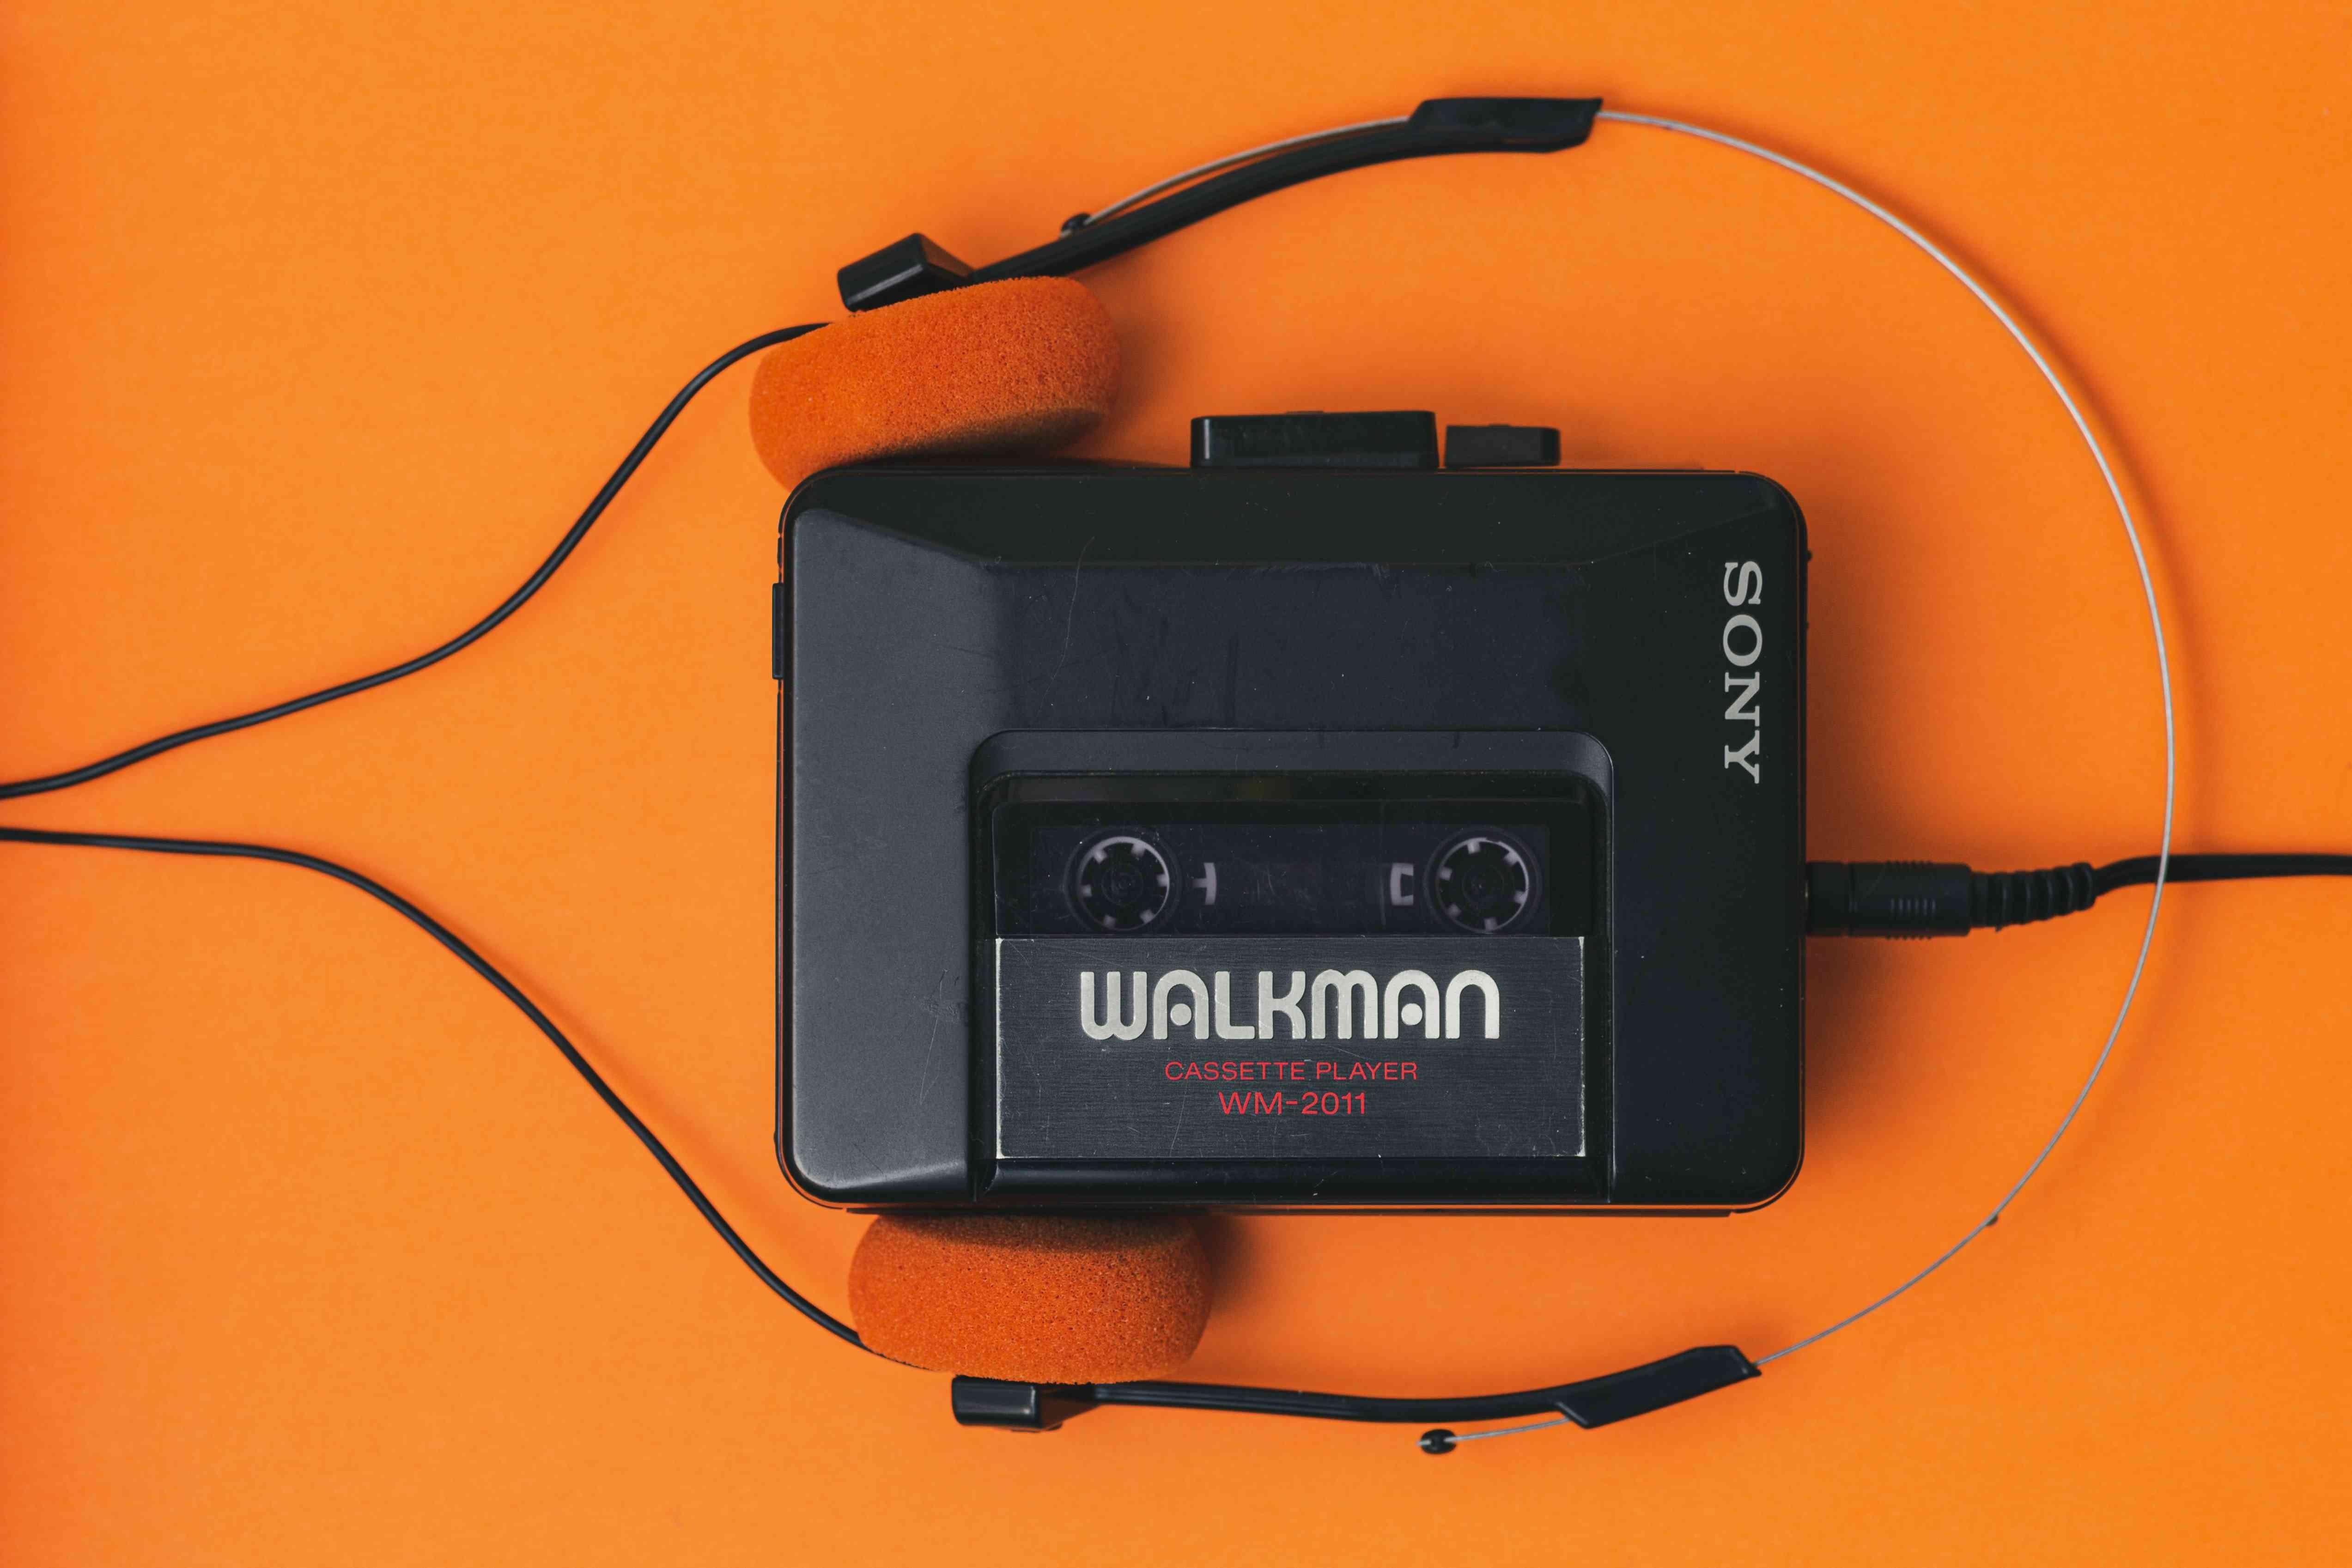 A Sony Walkman on an orange background.